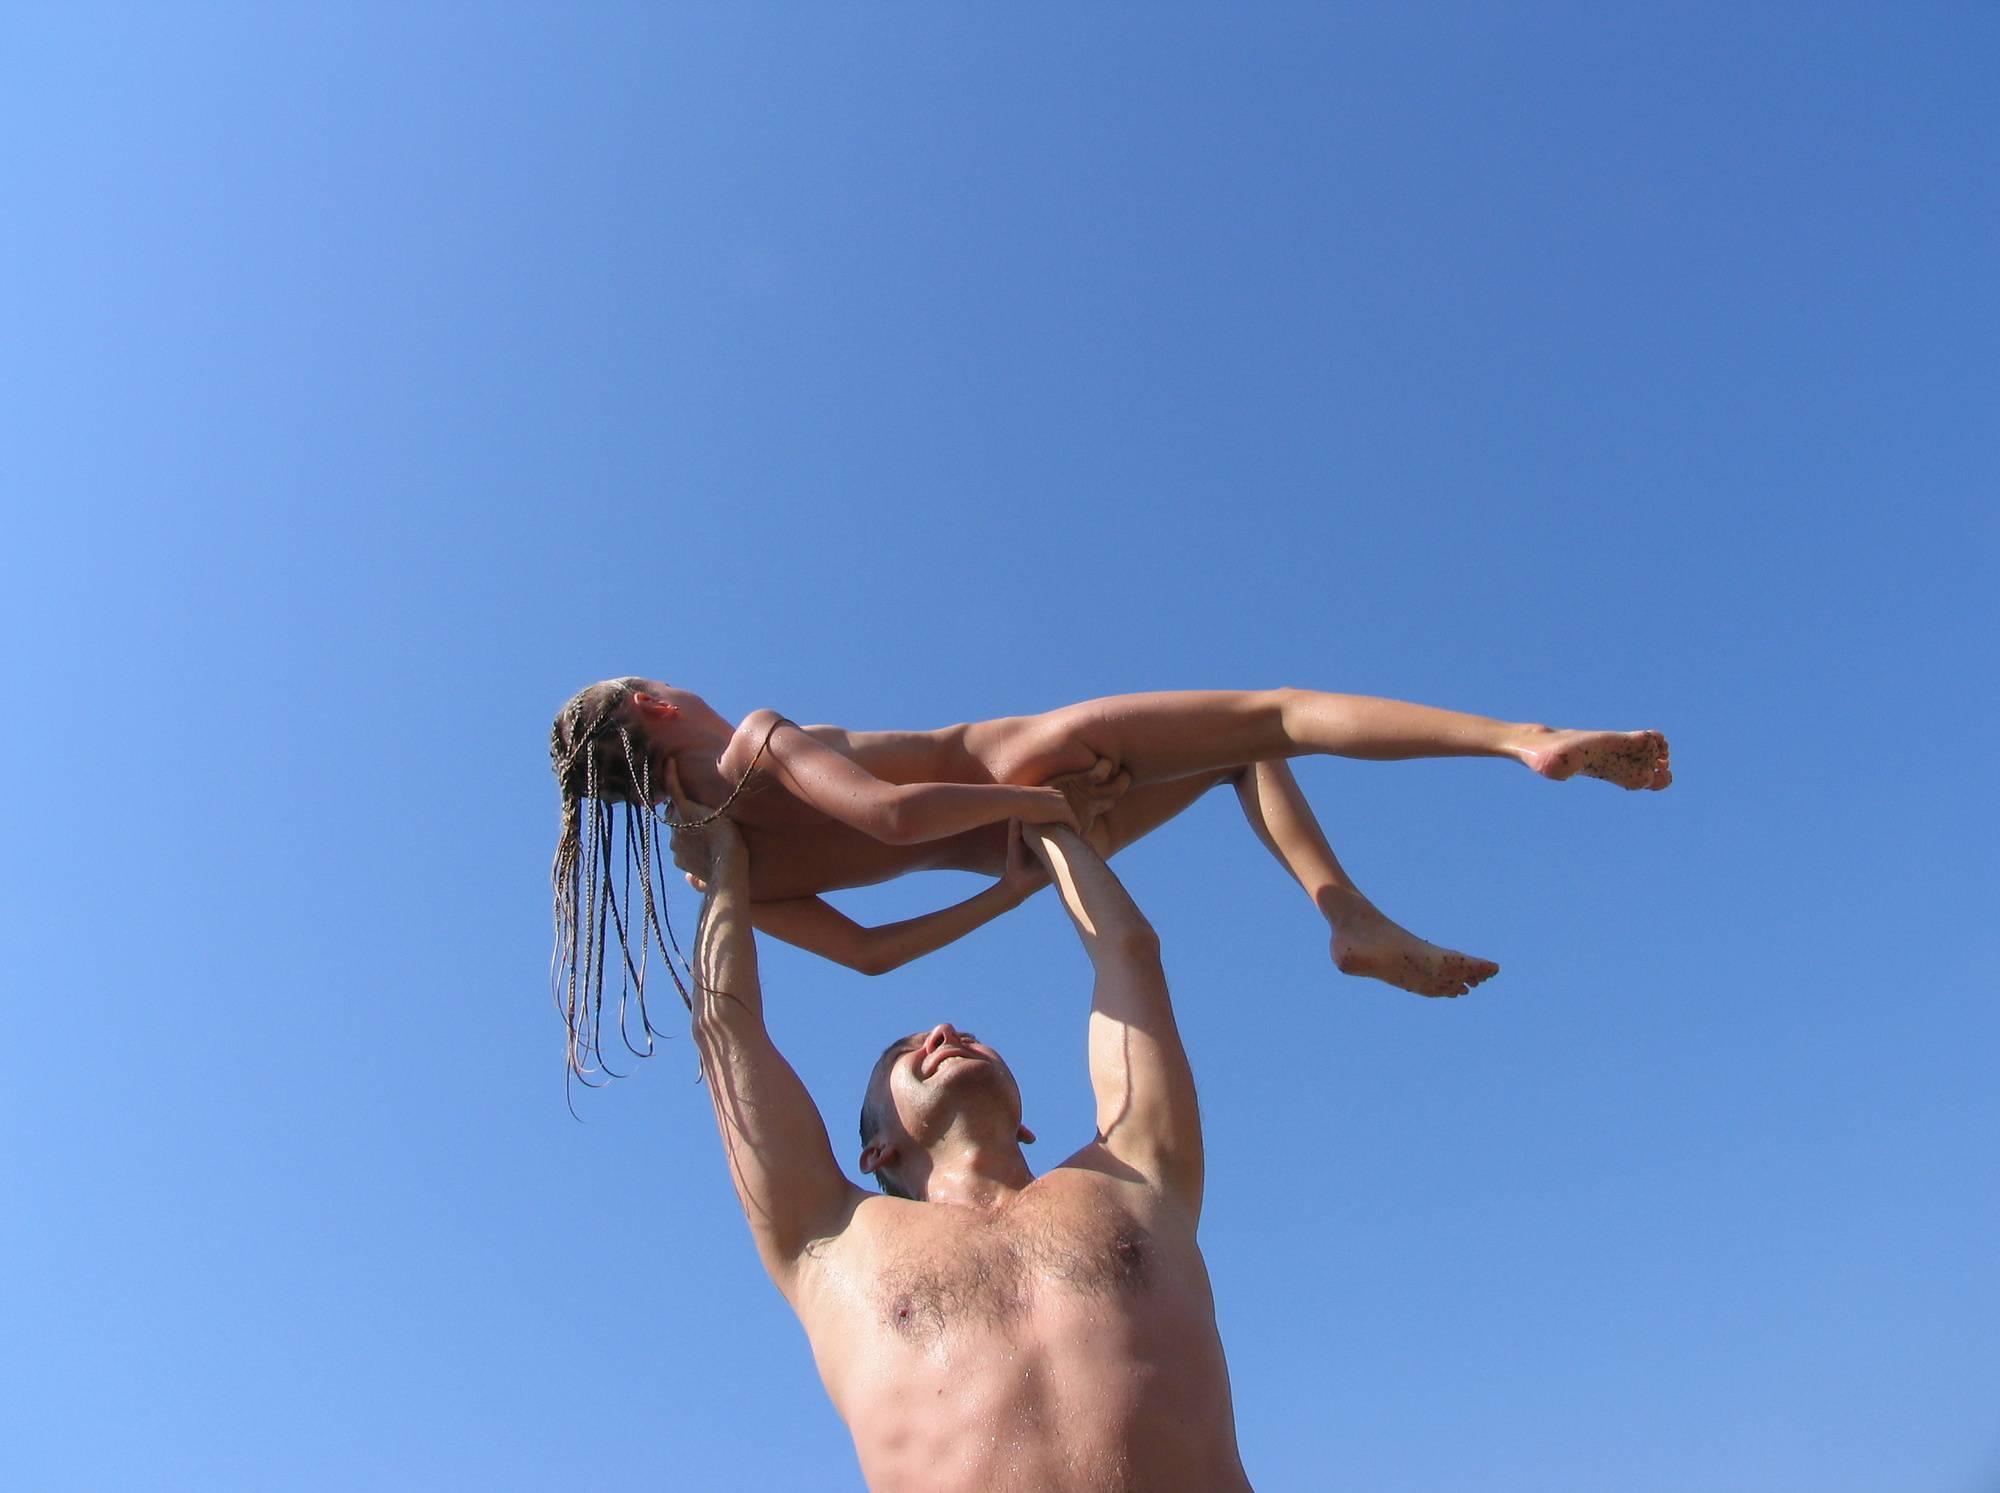 Nudist Pictures Mother-Daughter Waters - 1